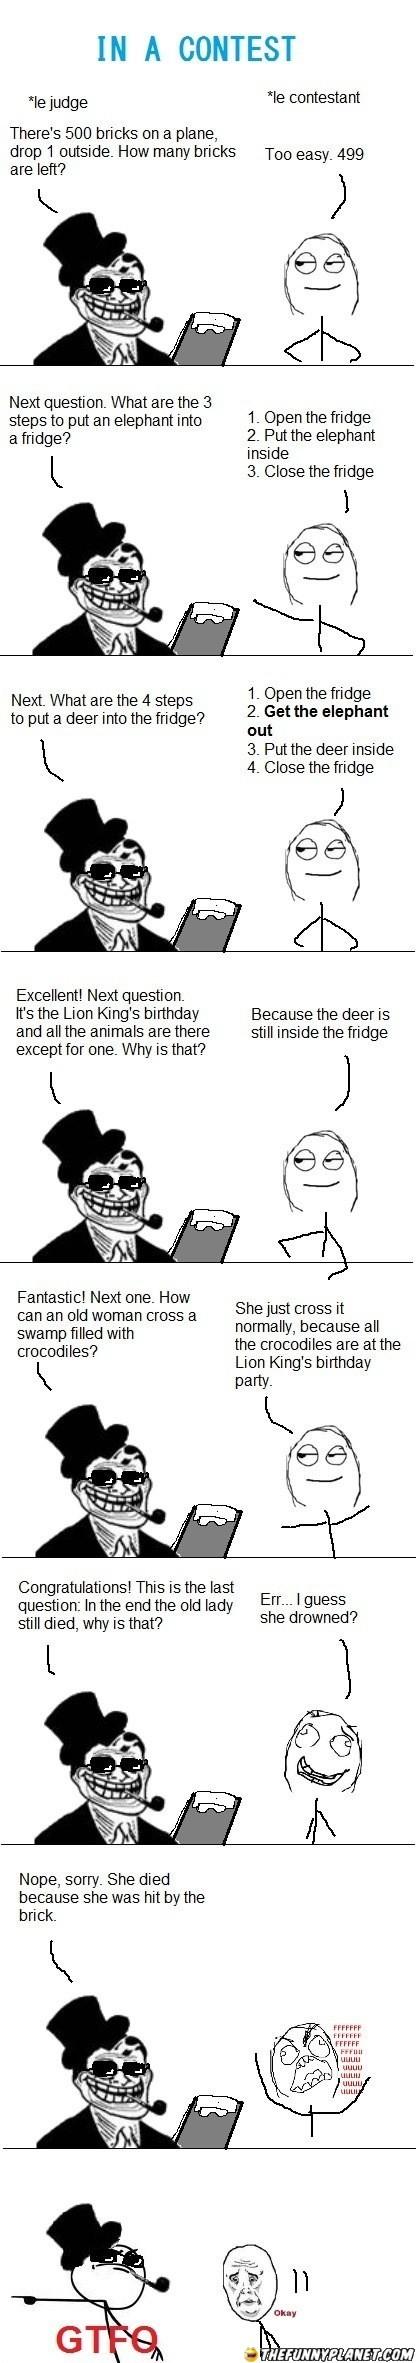 Hahaha my favourite joke!!